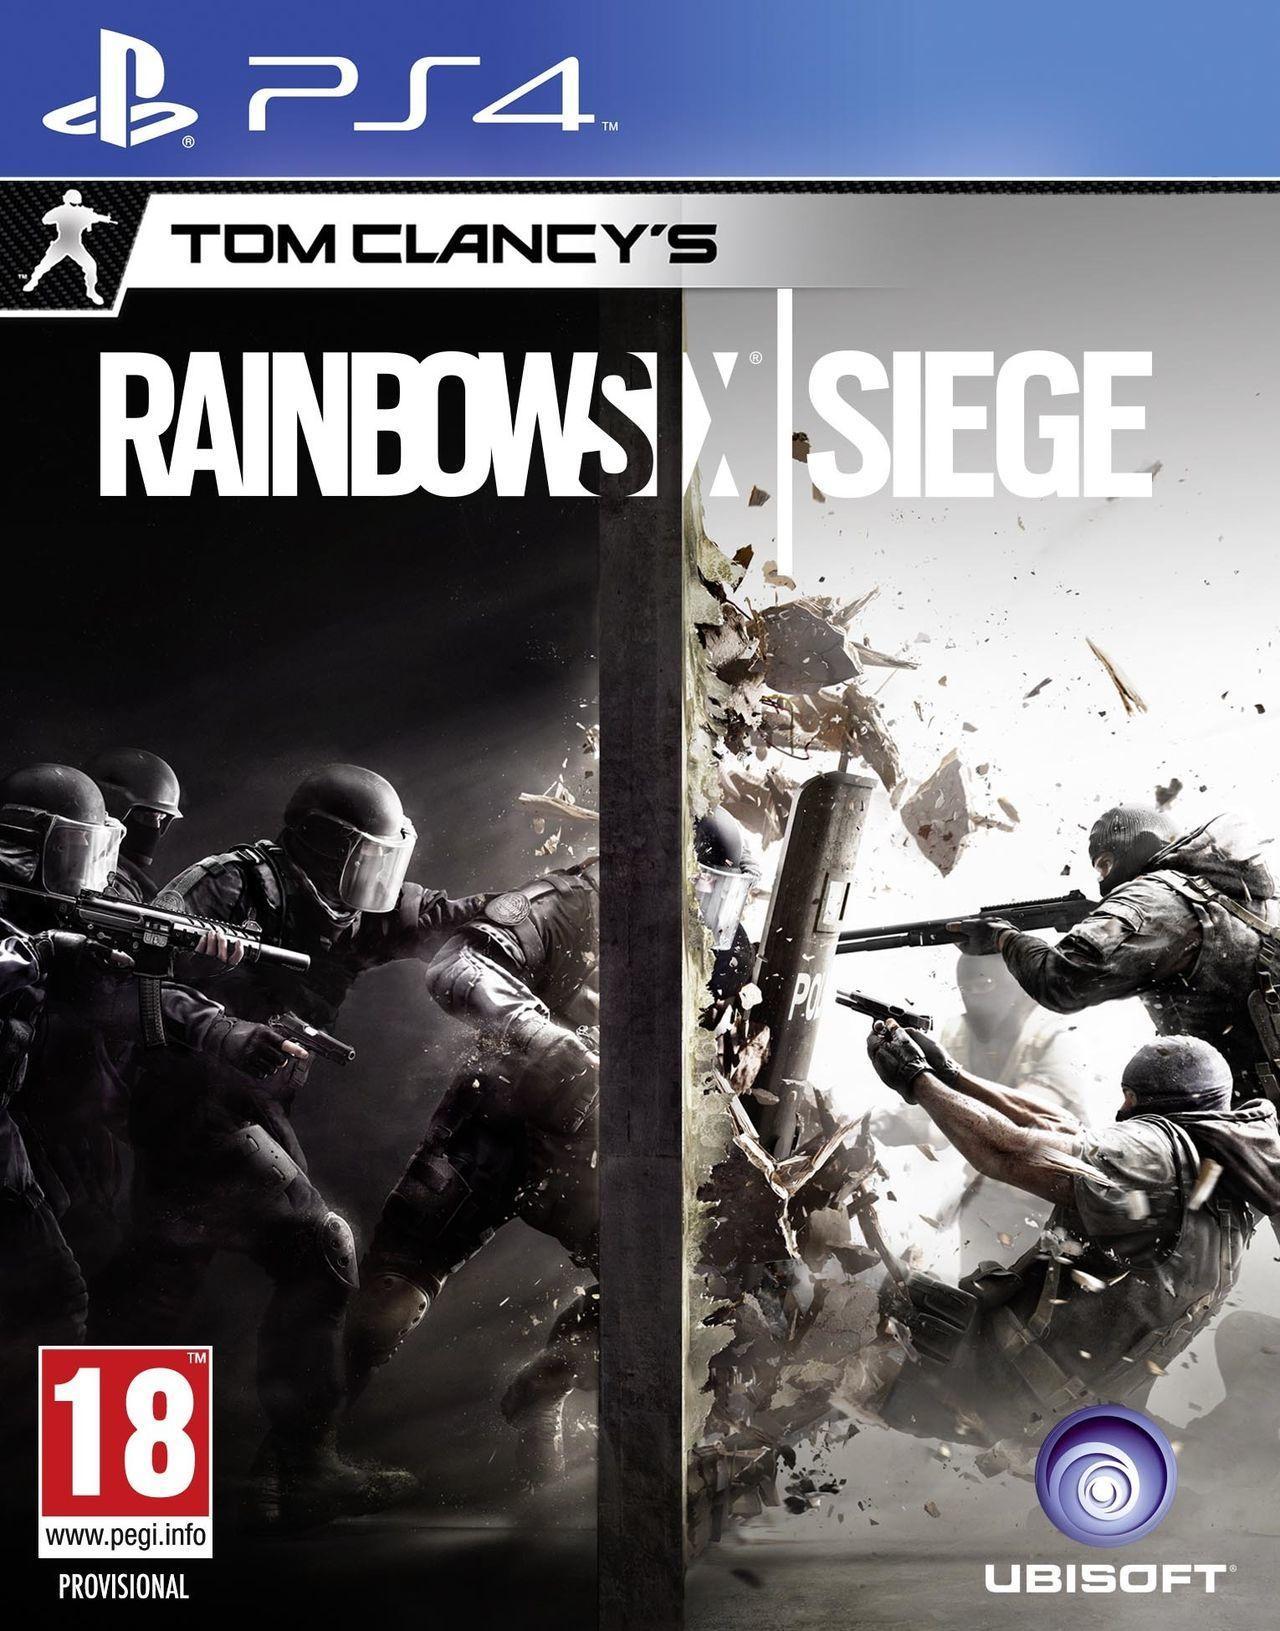 Tom Clancy's Rainbow Six: Siege sur PS4